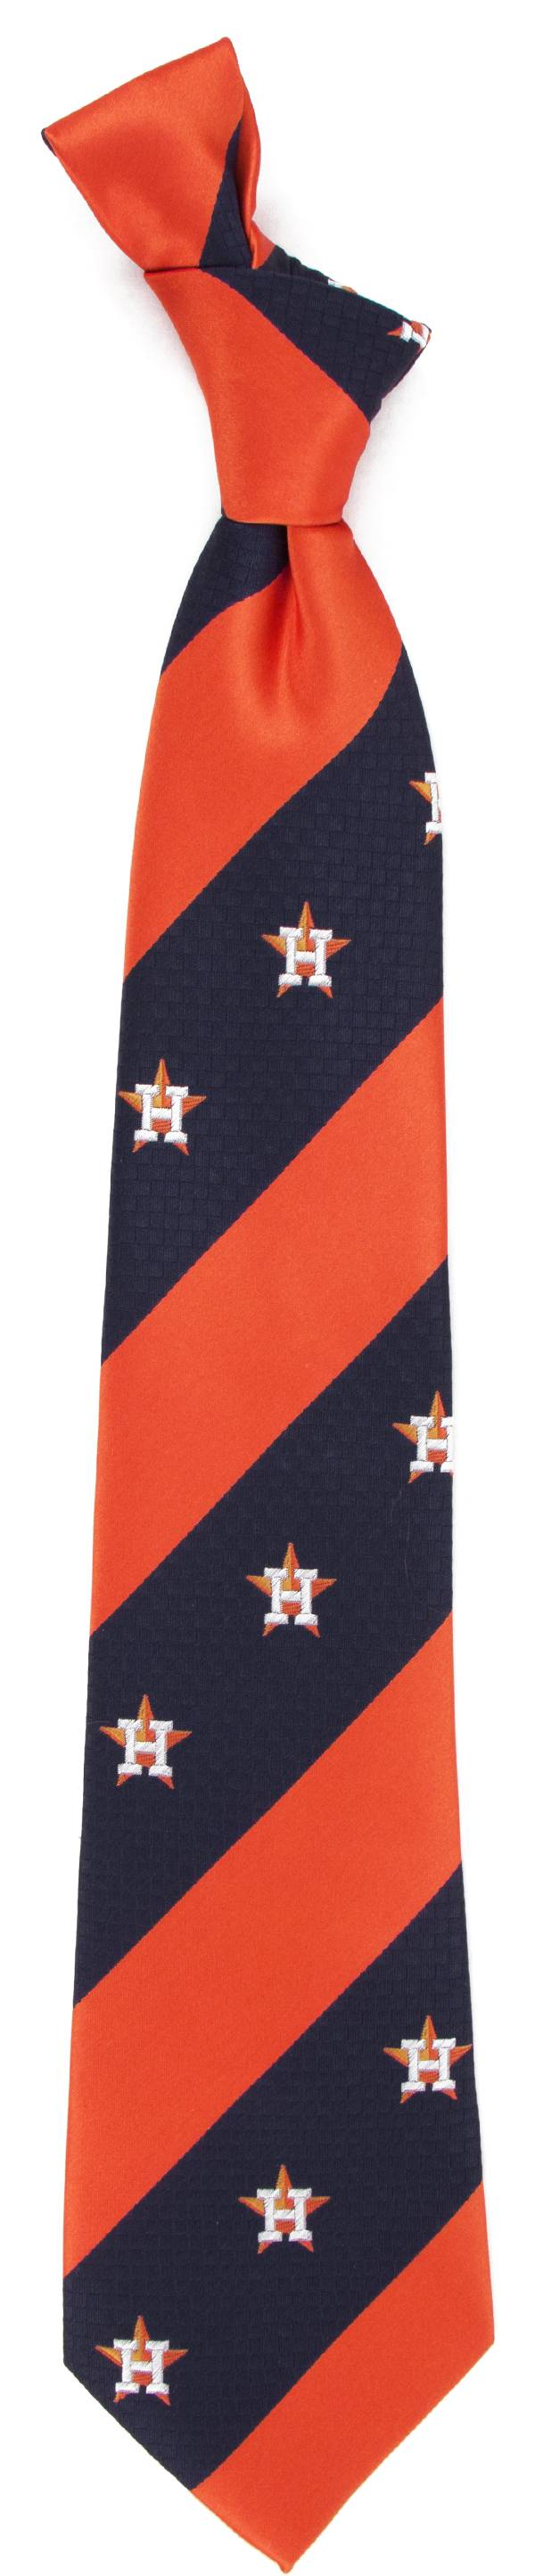 Eagles Wings Houston Astros Geo Stripe Necktie product image